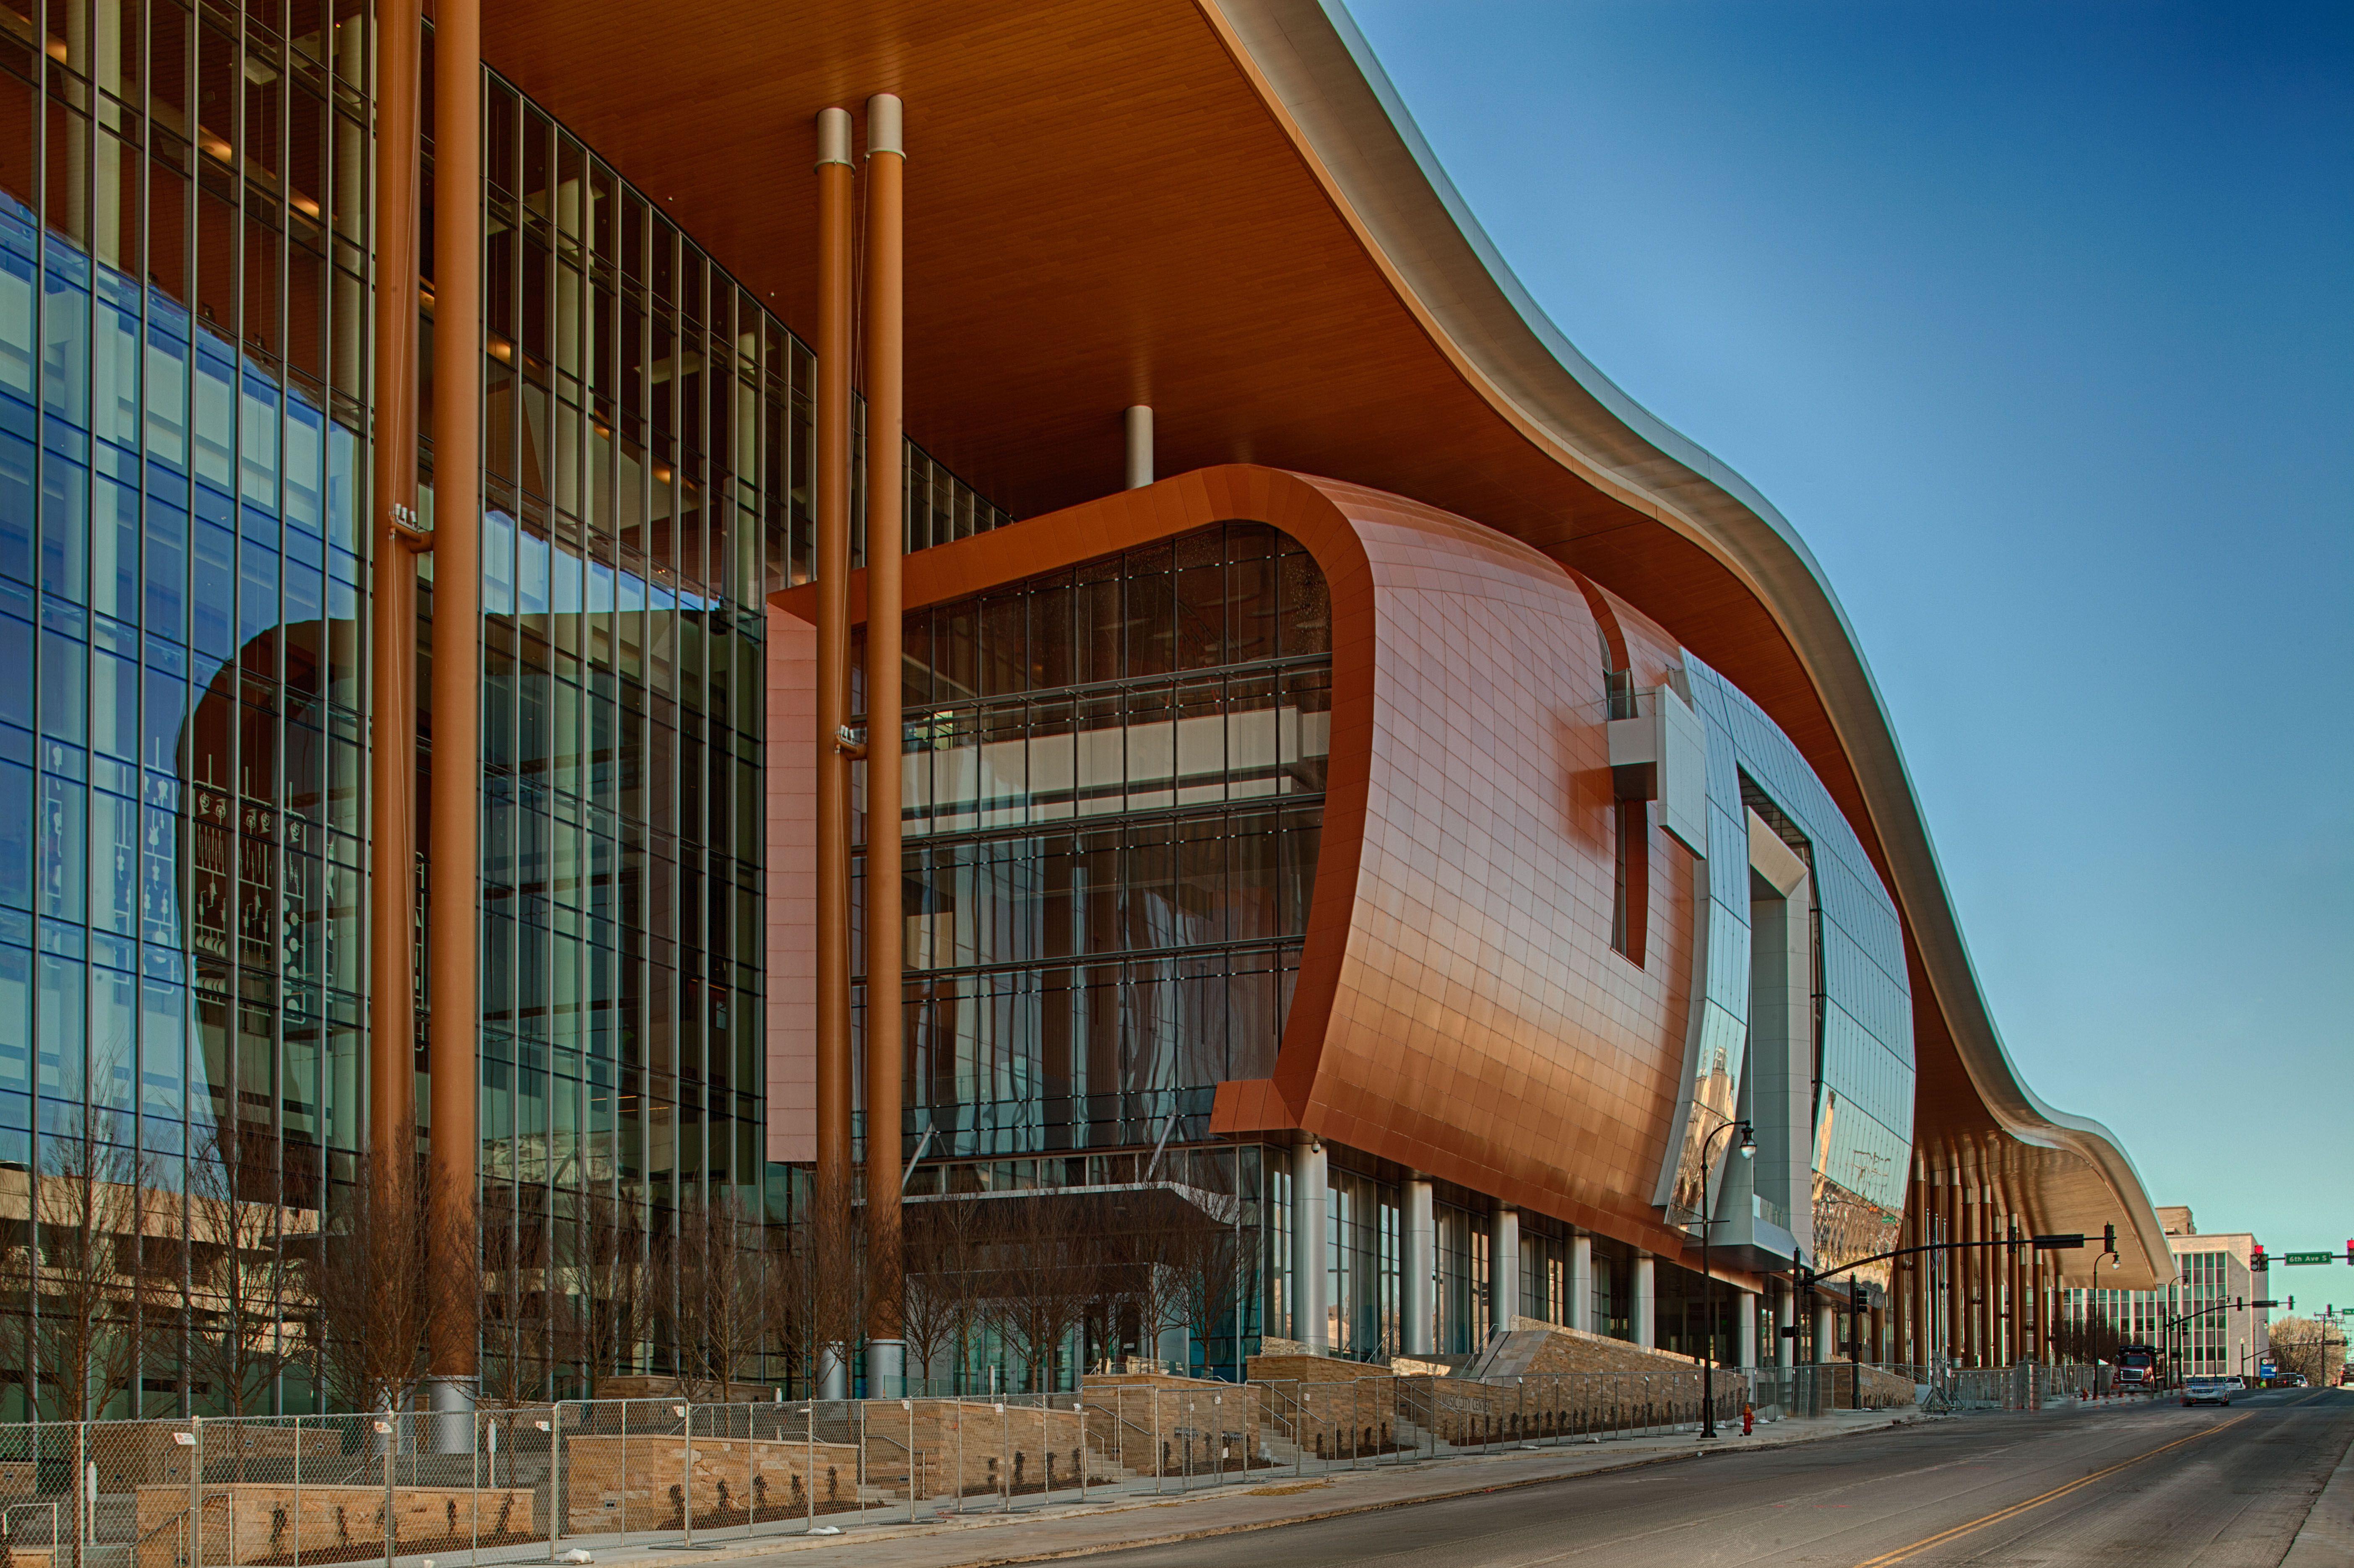 Nashville Tn Nashville Music City Center Theater Architecture Music City Music City Nashville